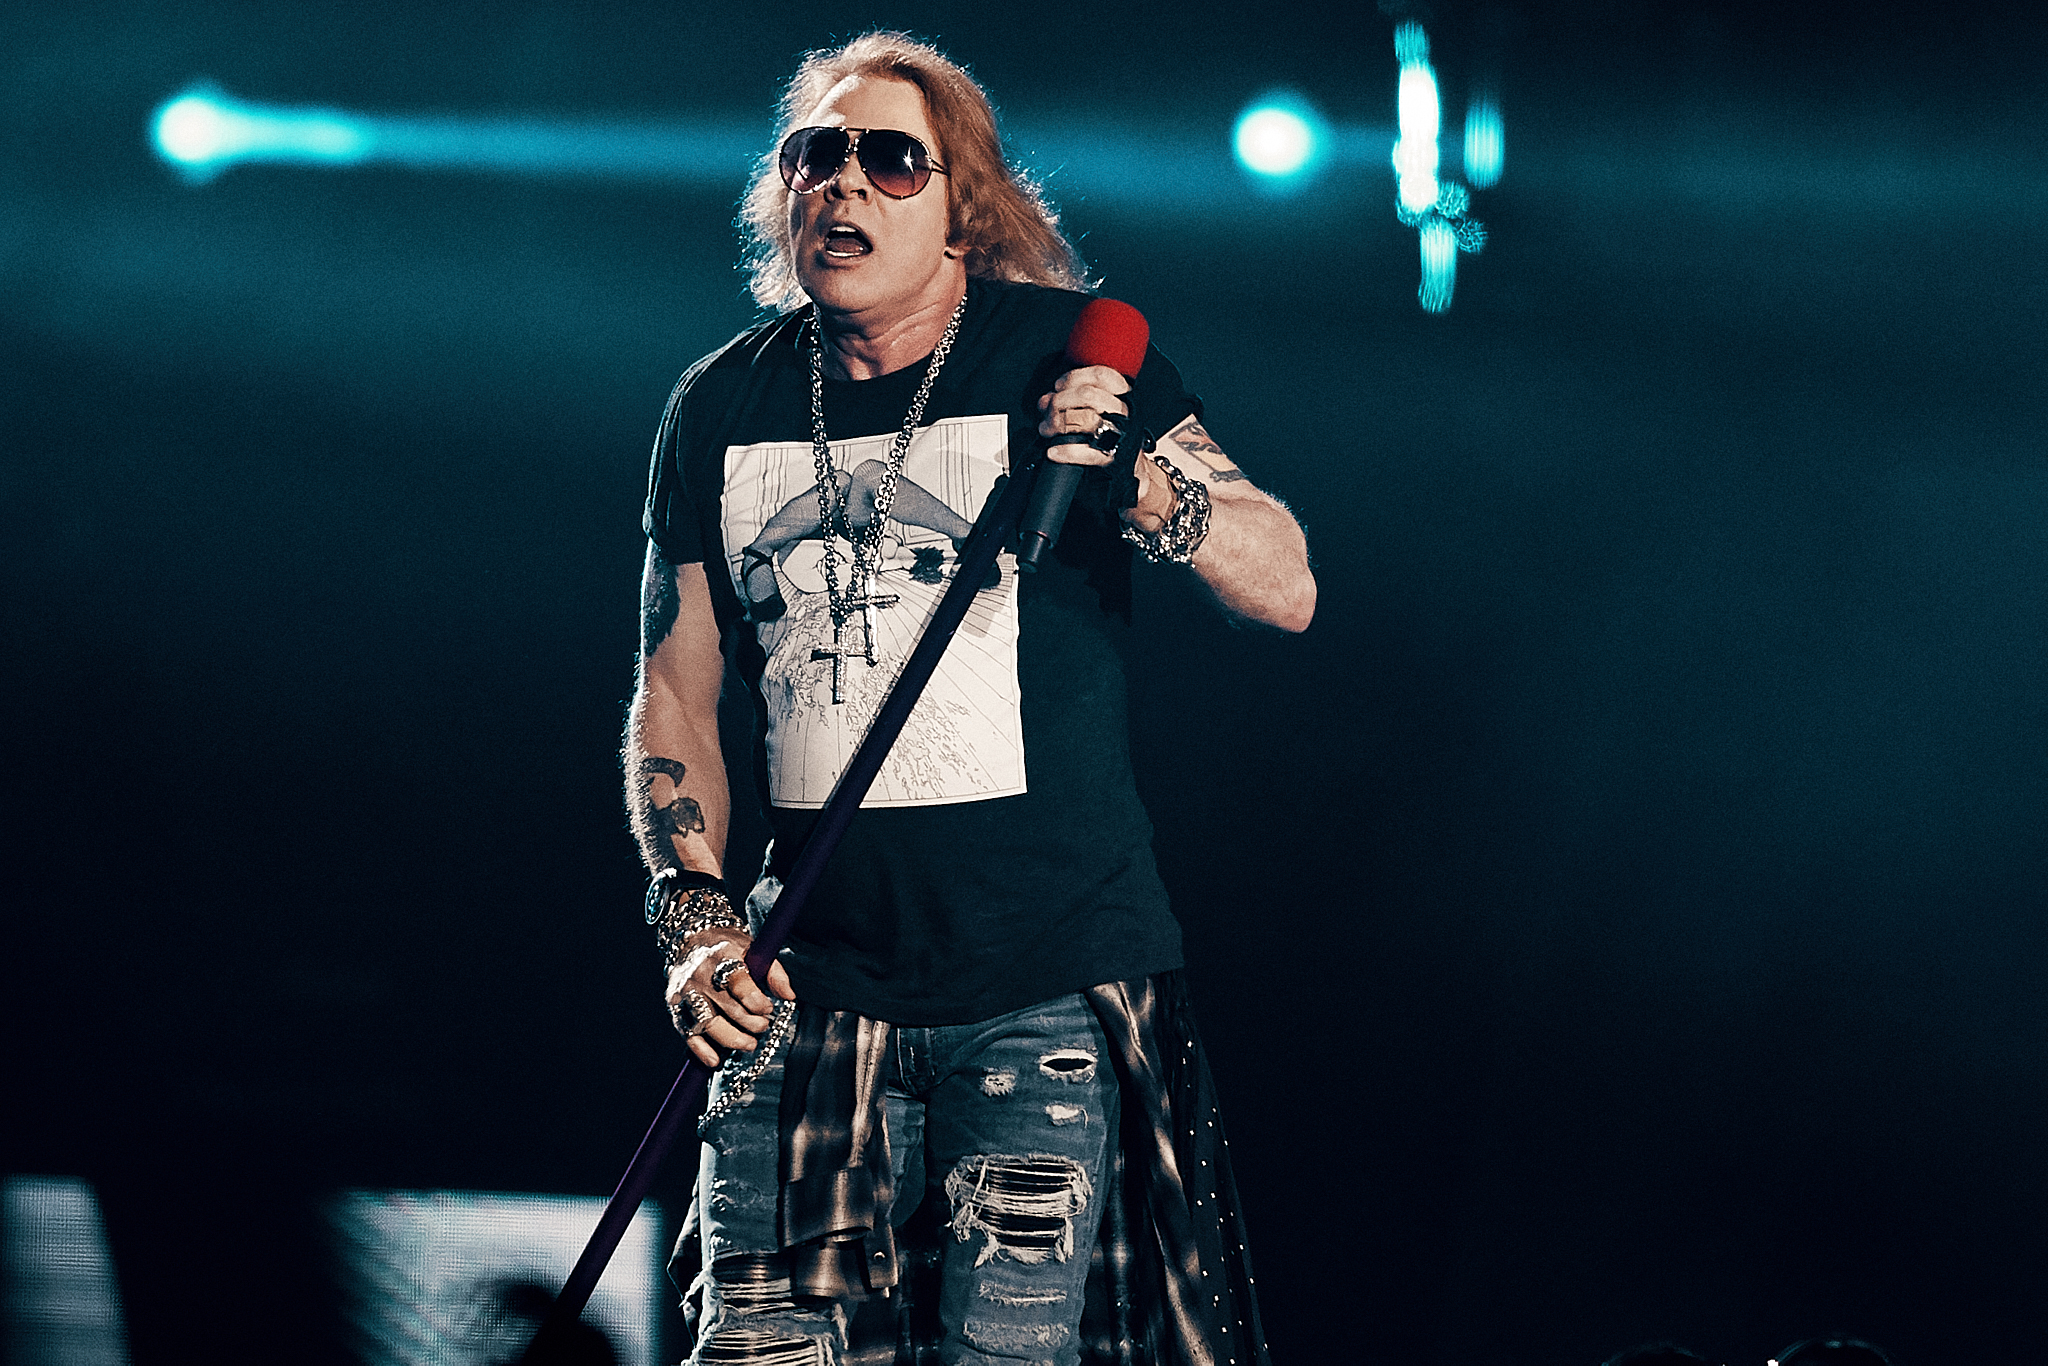 Guns_N_Roses_US_Bank_Stadium_Minneapolis_Minnesota_Photography_By_Joe_Lemke_029.JPG